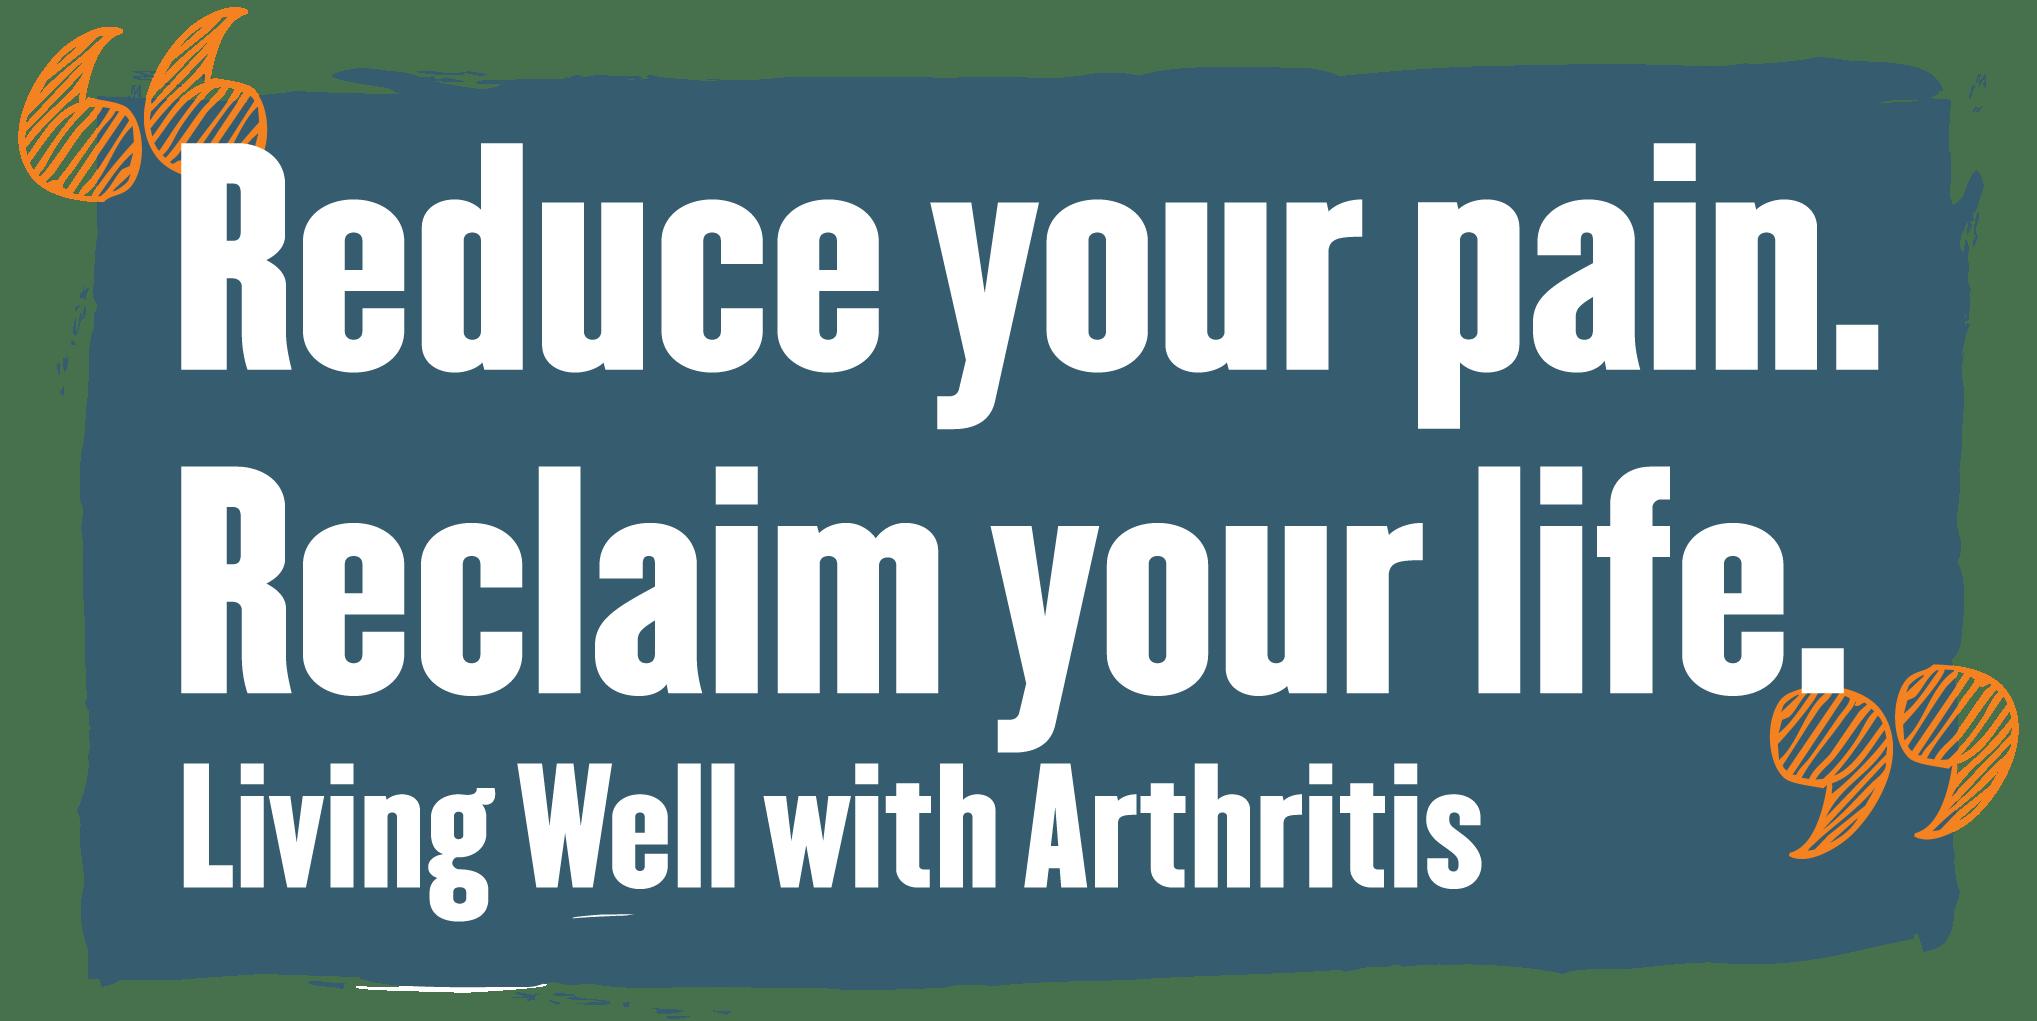 Living Well with Arthritis course, Dublin - Coolmine